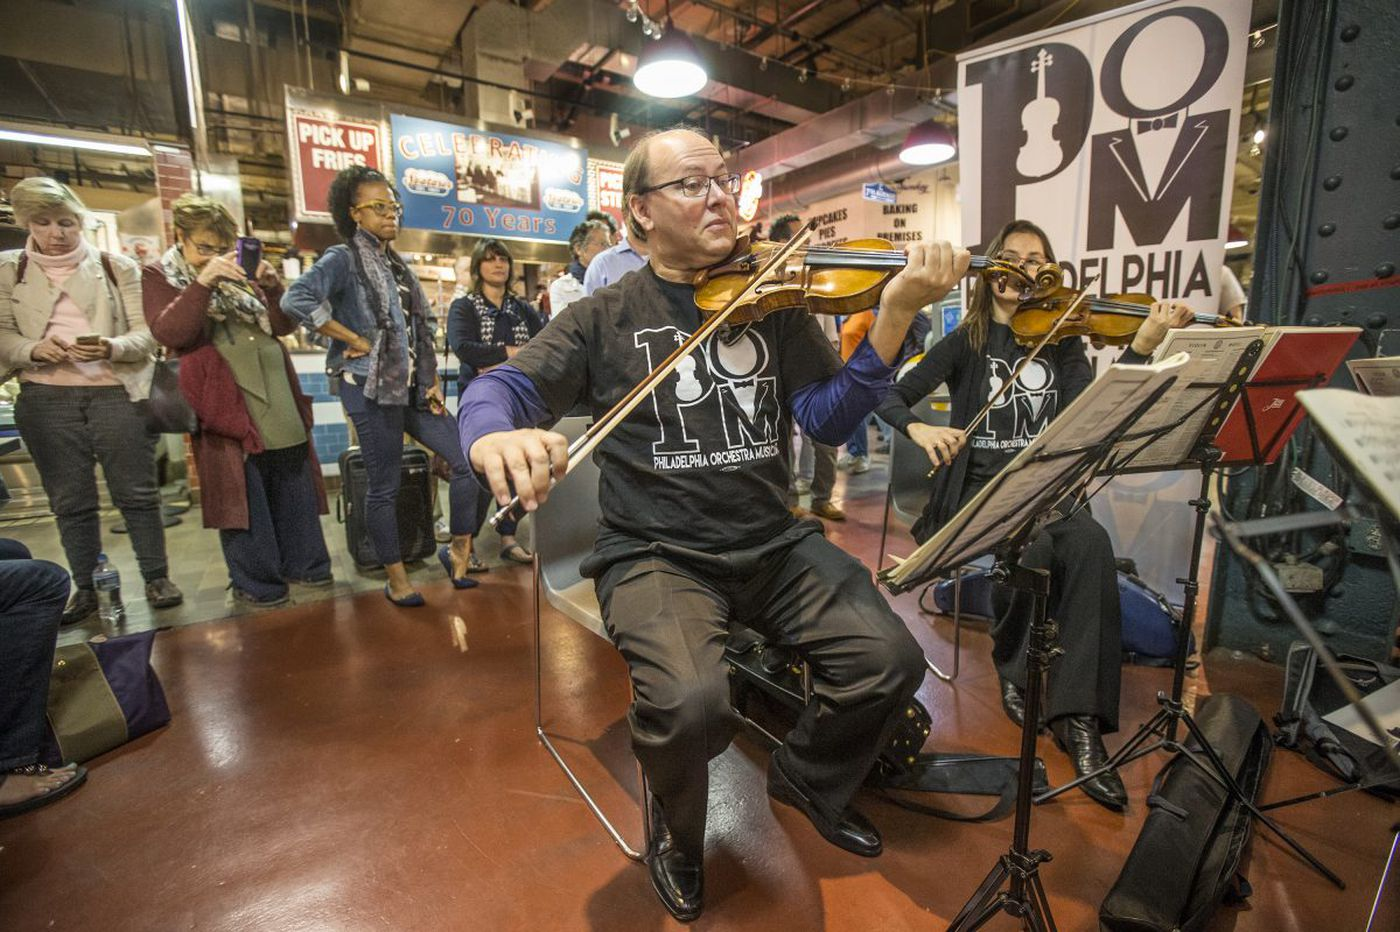 Philadelphia Orchestra musicians fan out across region, cheesesteaks sizzling in accompaniment